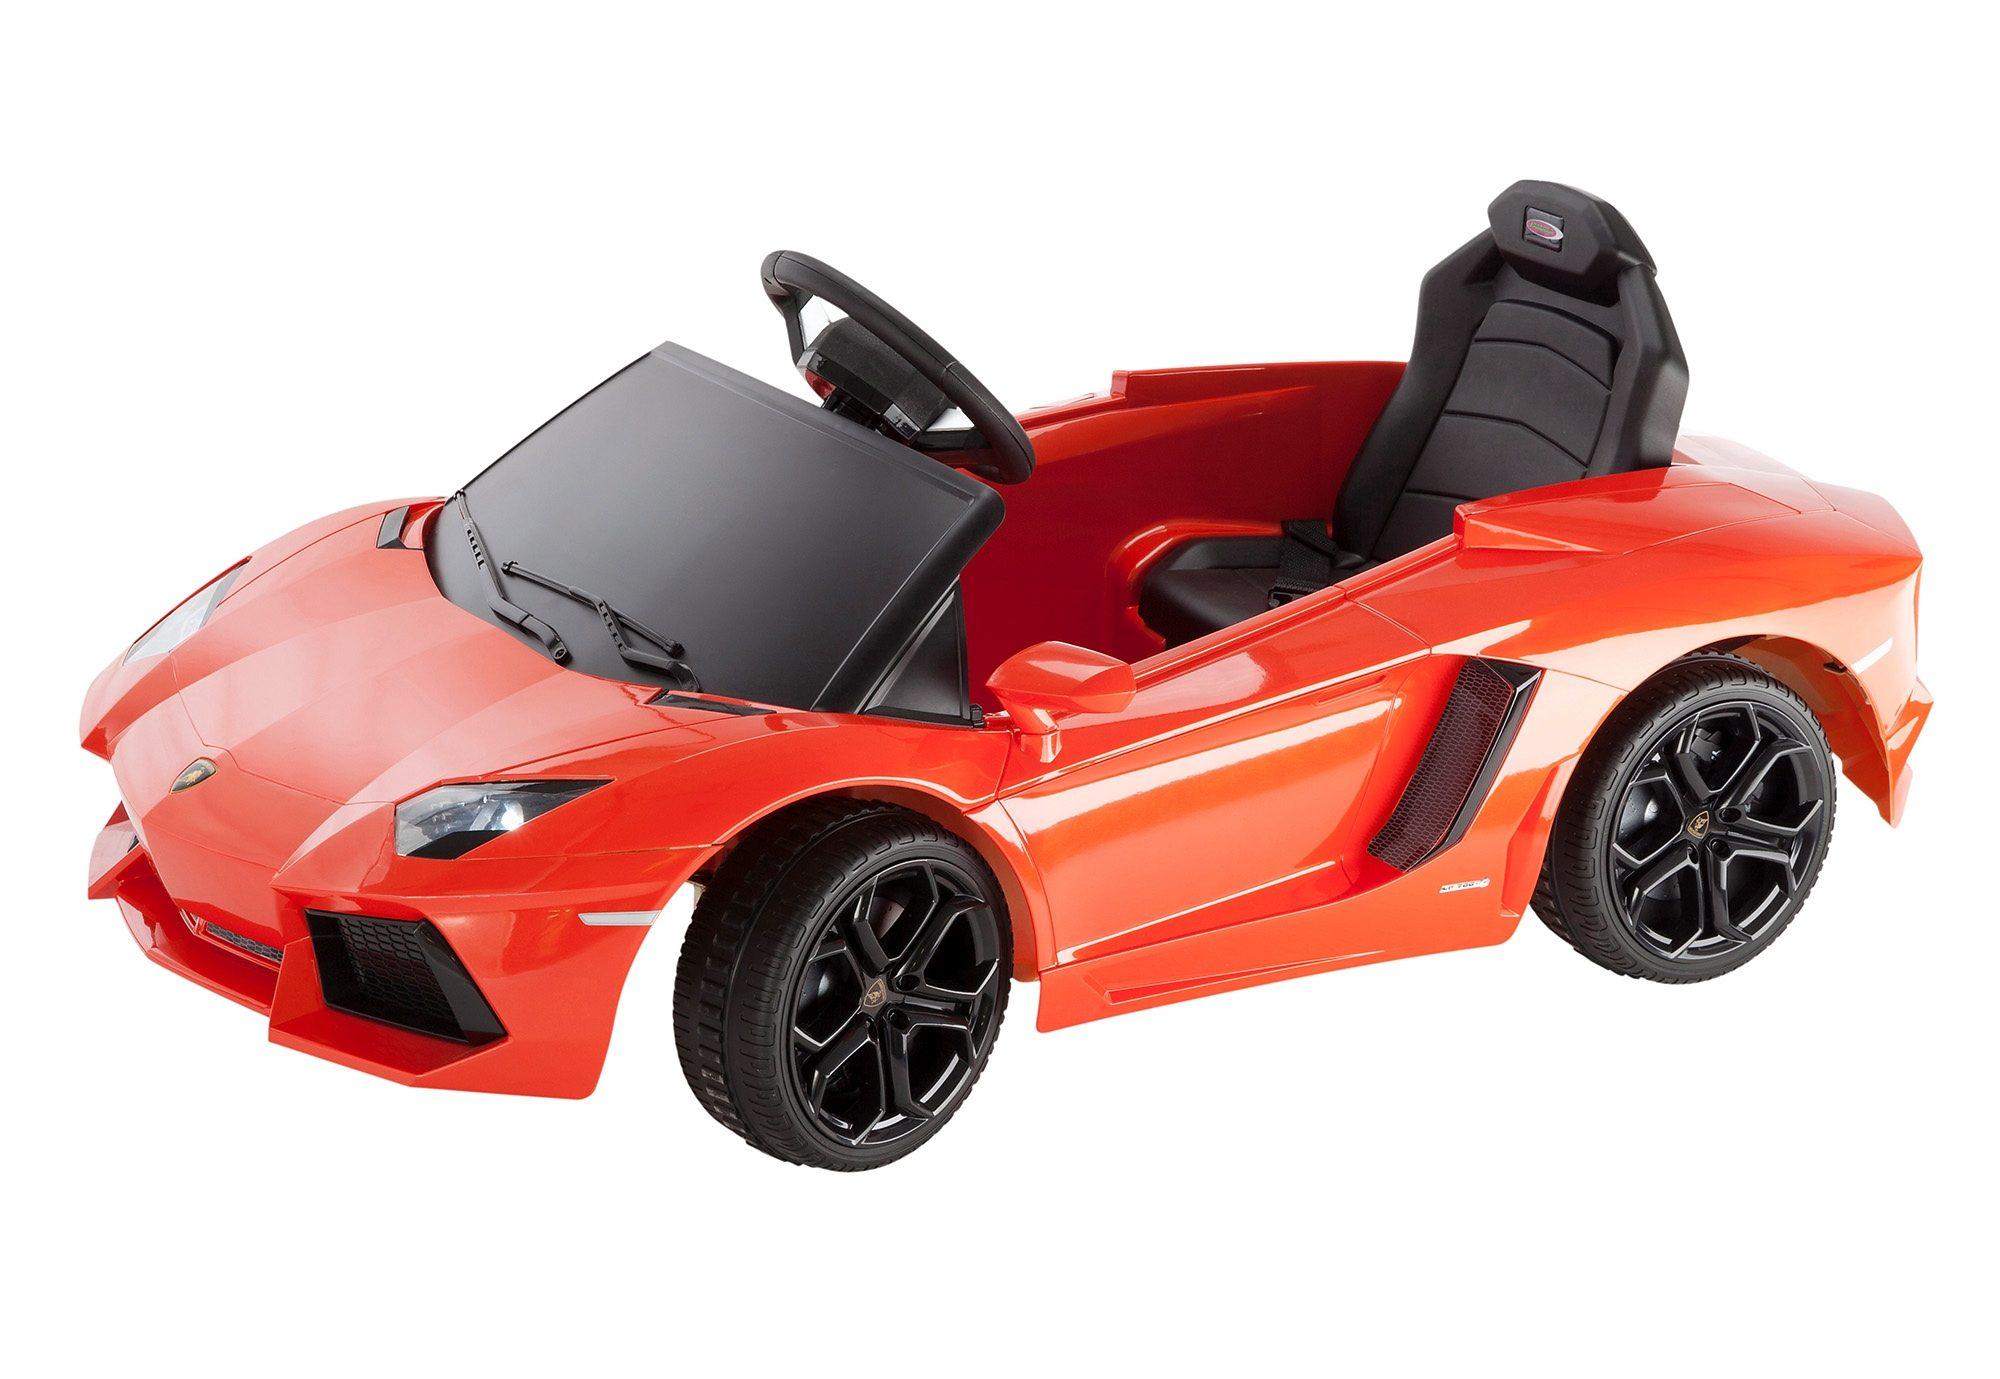 JAMARA Kinder-Fahrzeug, »JAMARA KIDS Ride-On Lamborghini Aventador«